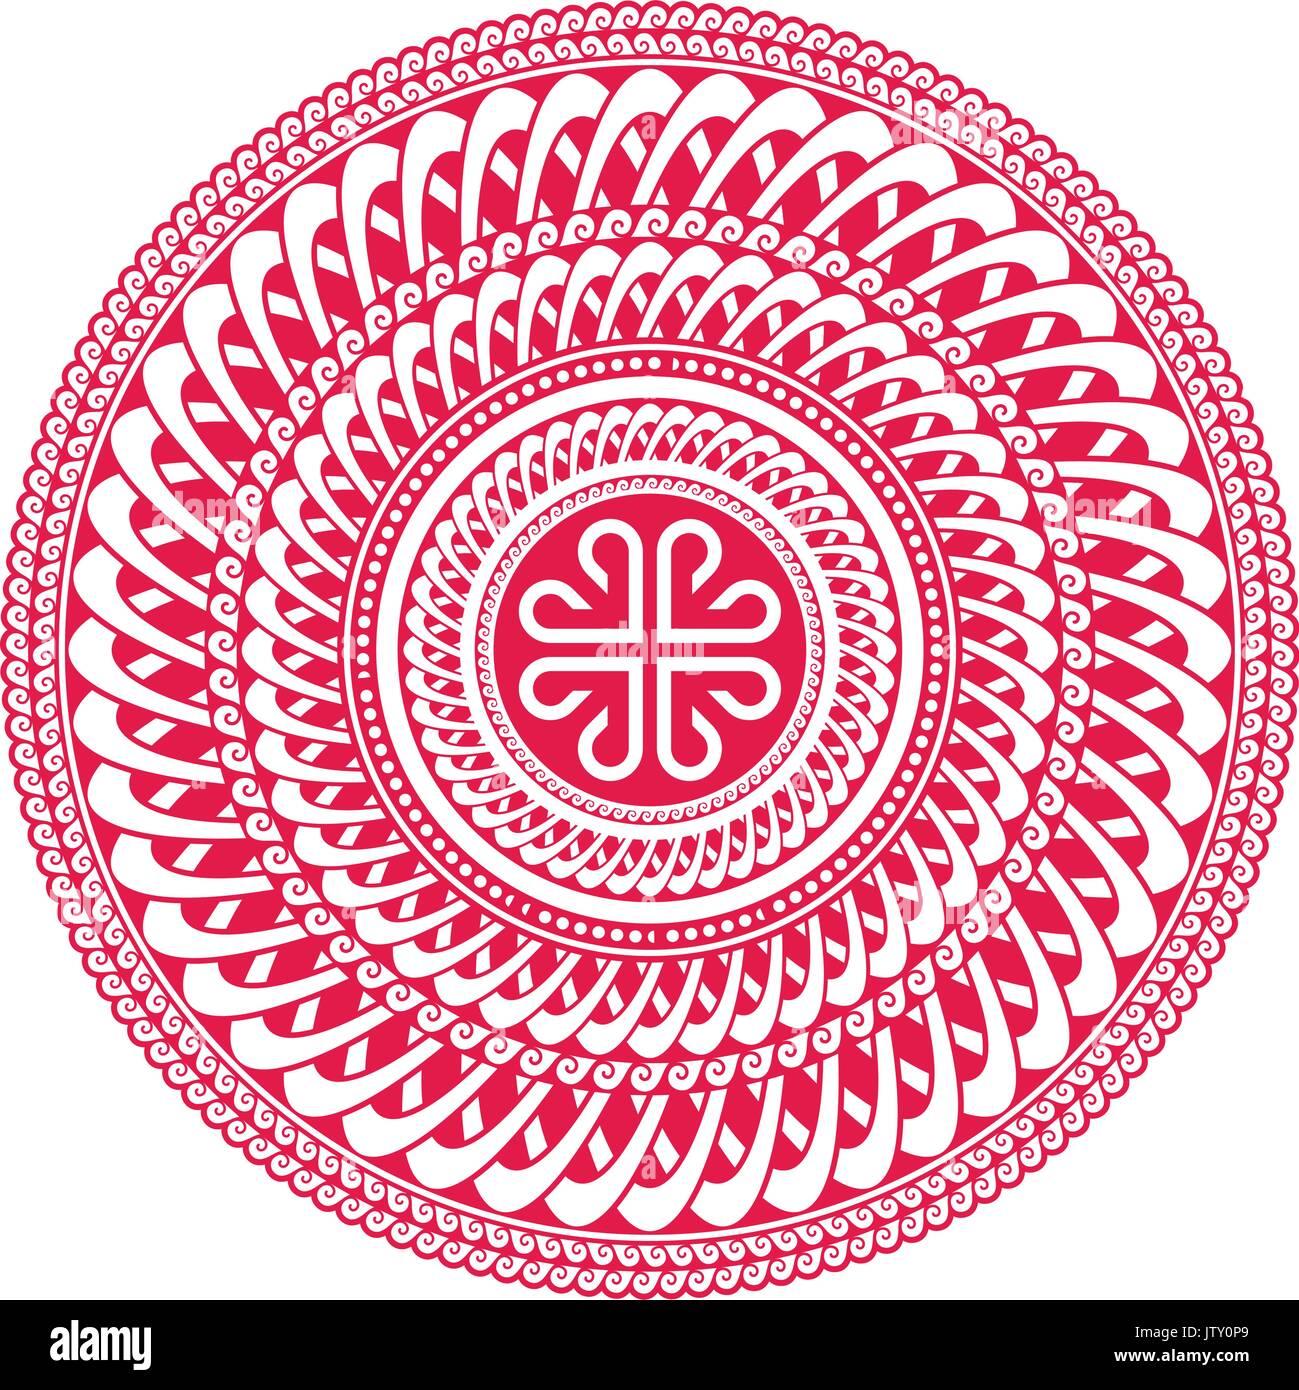 Mandala. Mongolian National ornament element for designers. - Stock Vector